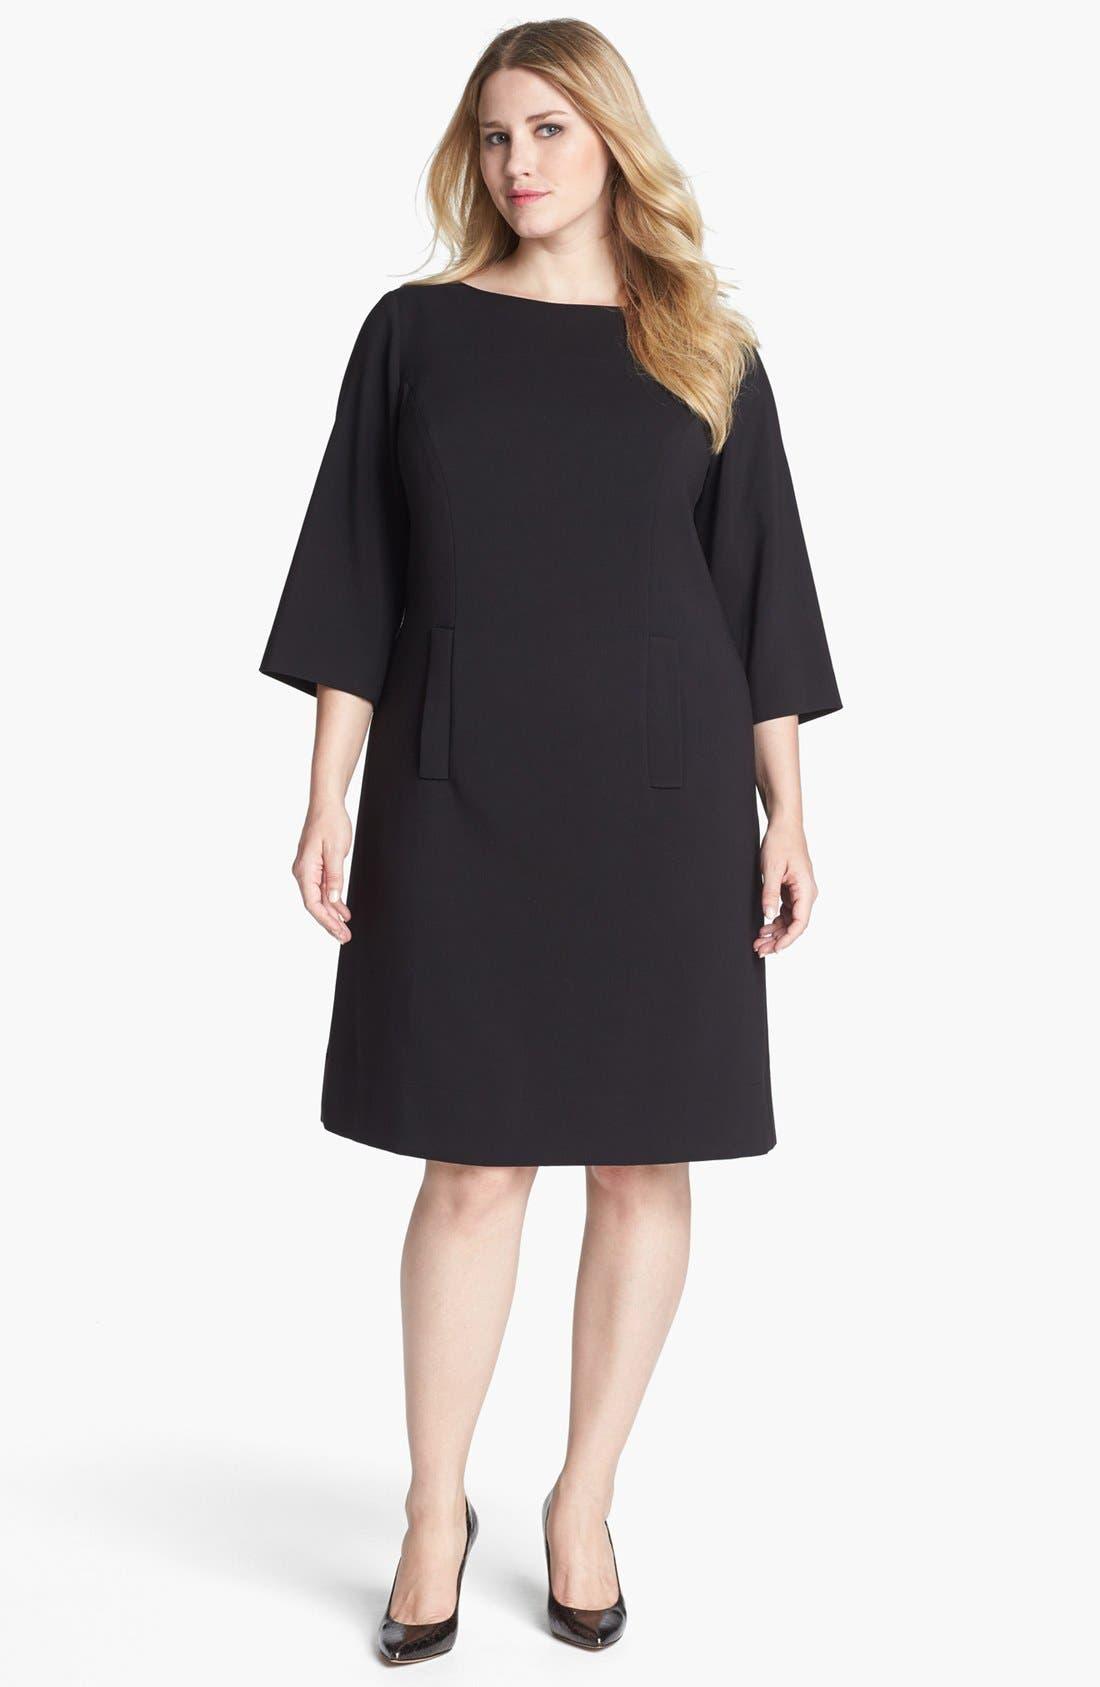 Alternate Image 1 Selected - Eliza J Ponte Knit Shift Dress